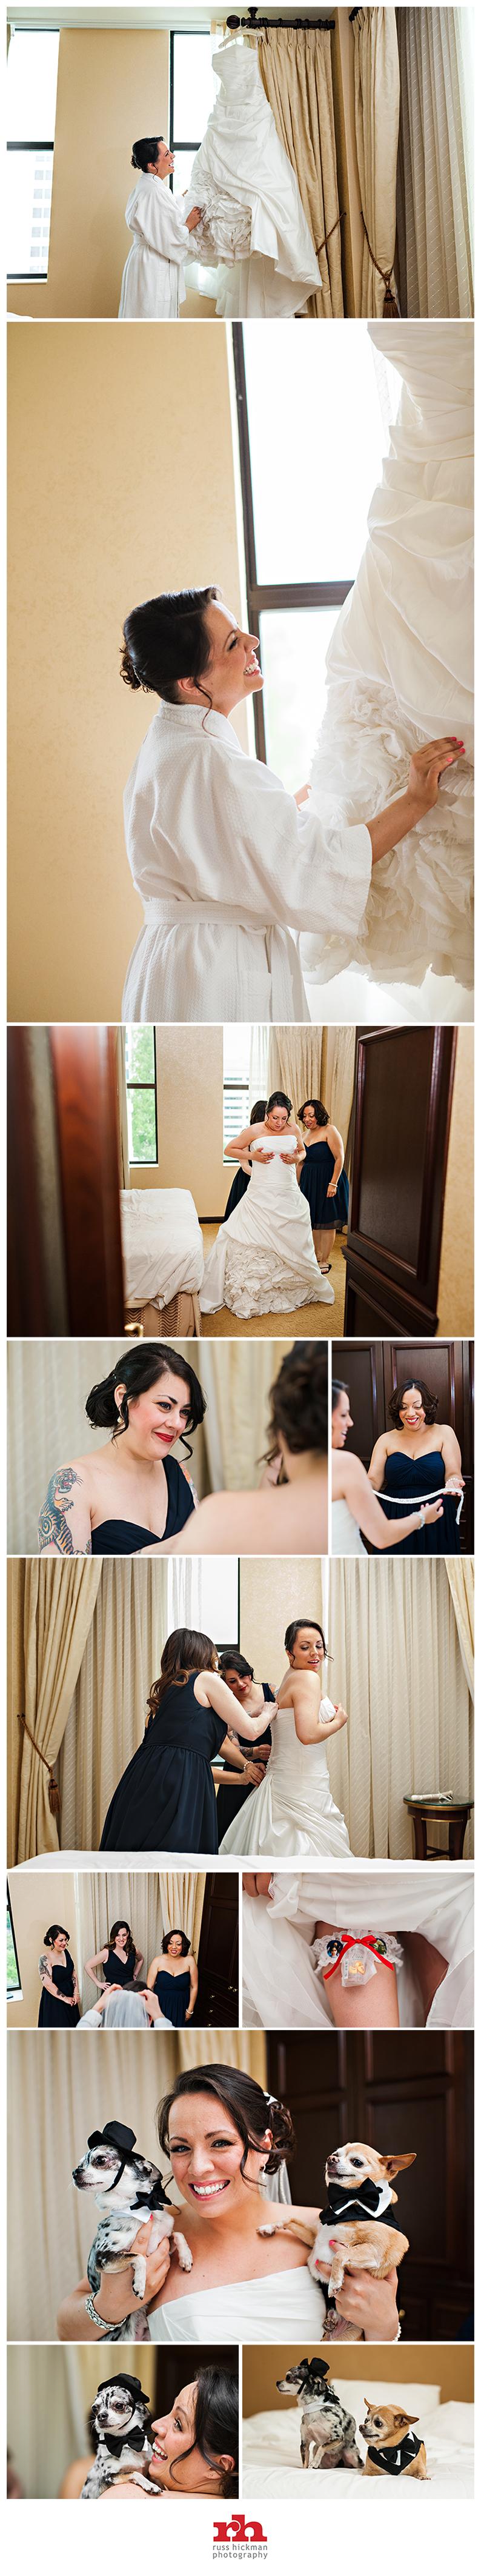 Philadelphia Wedding Photographer ABWB0003